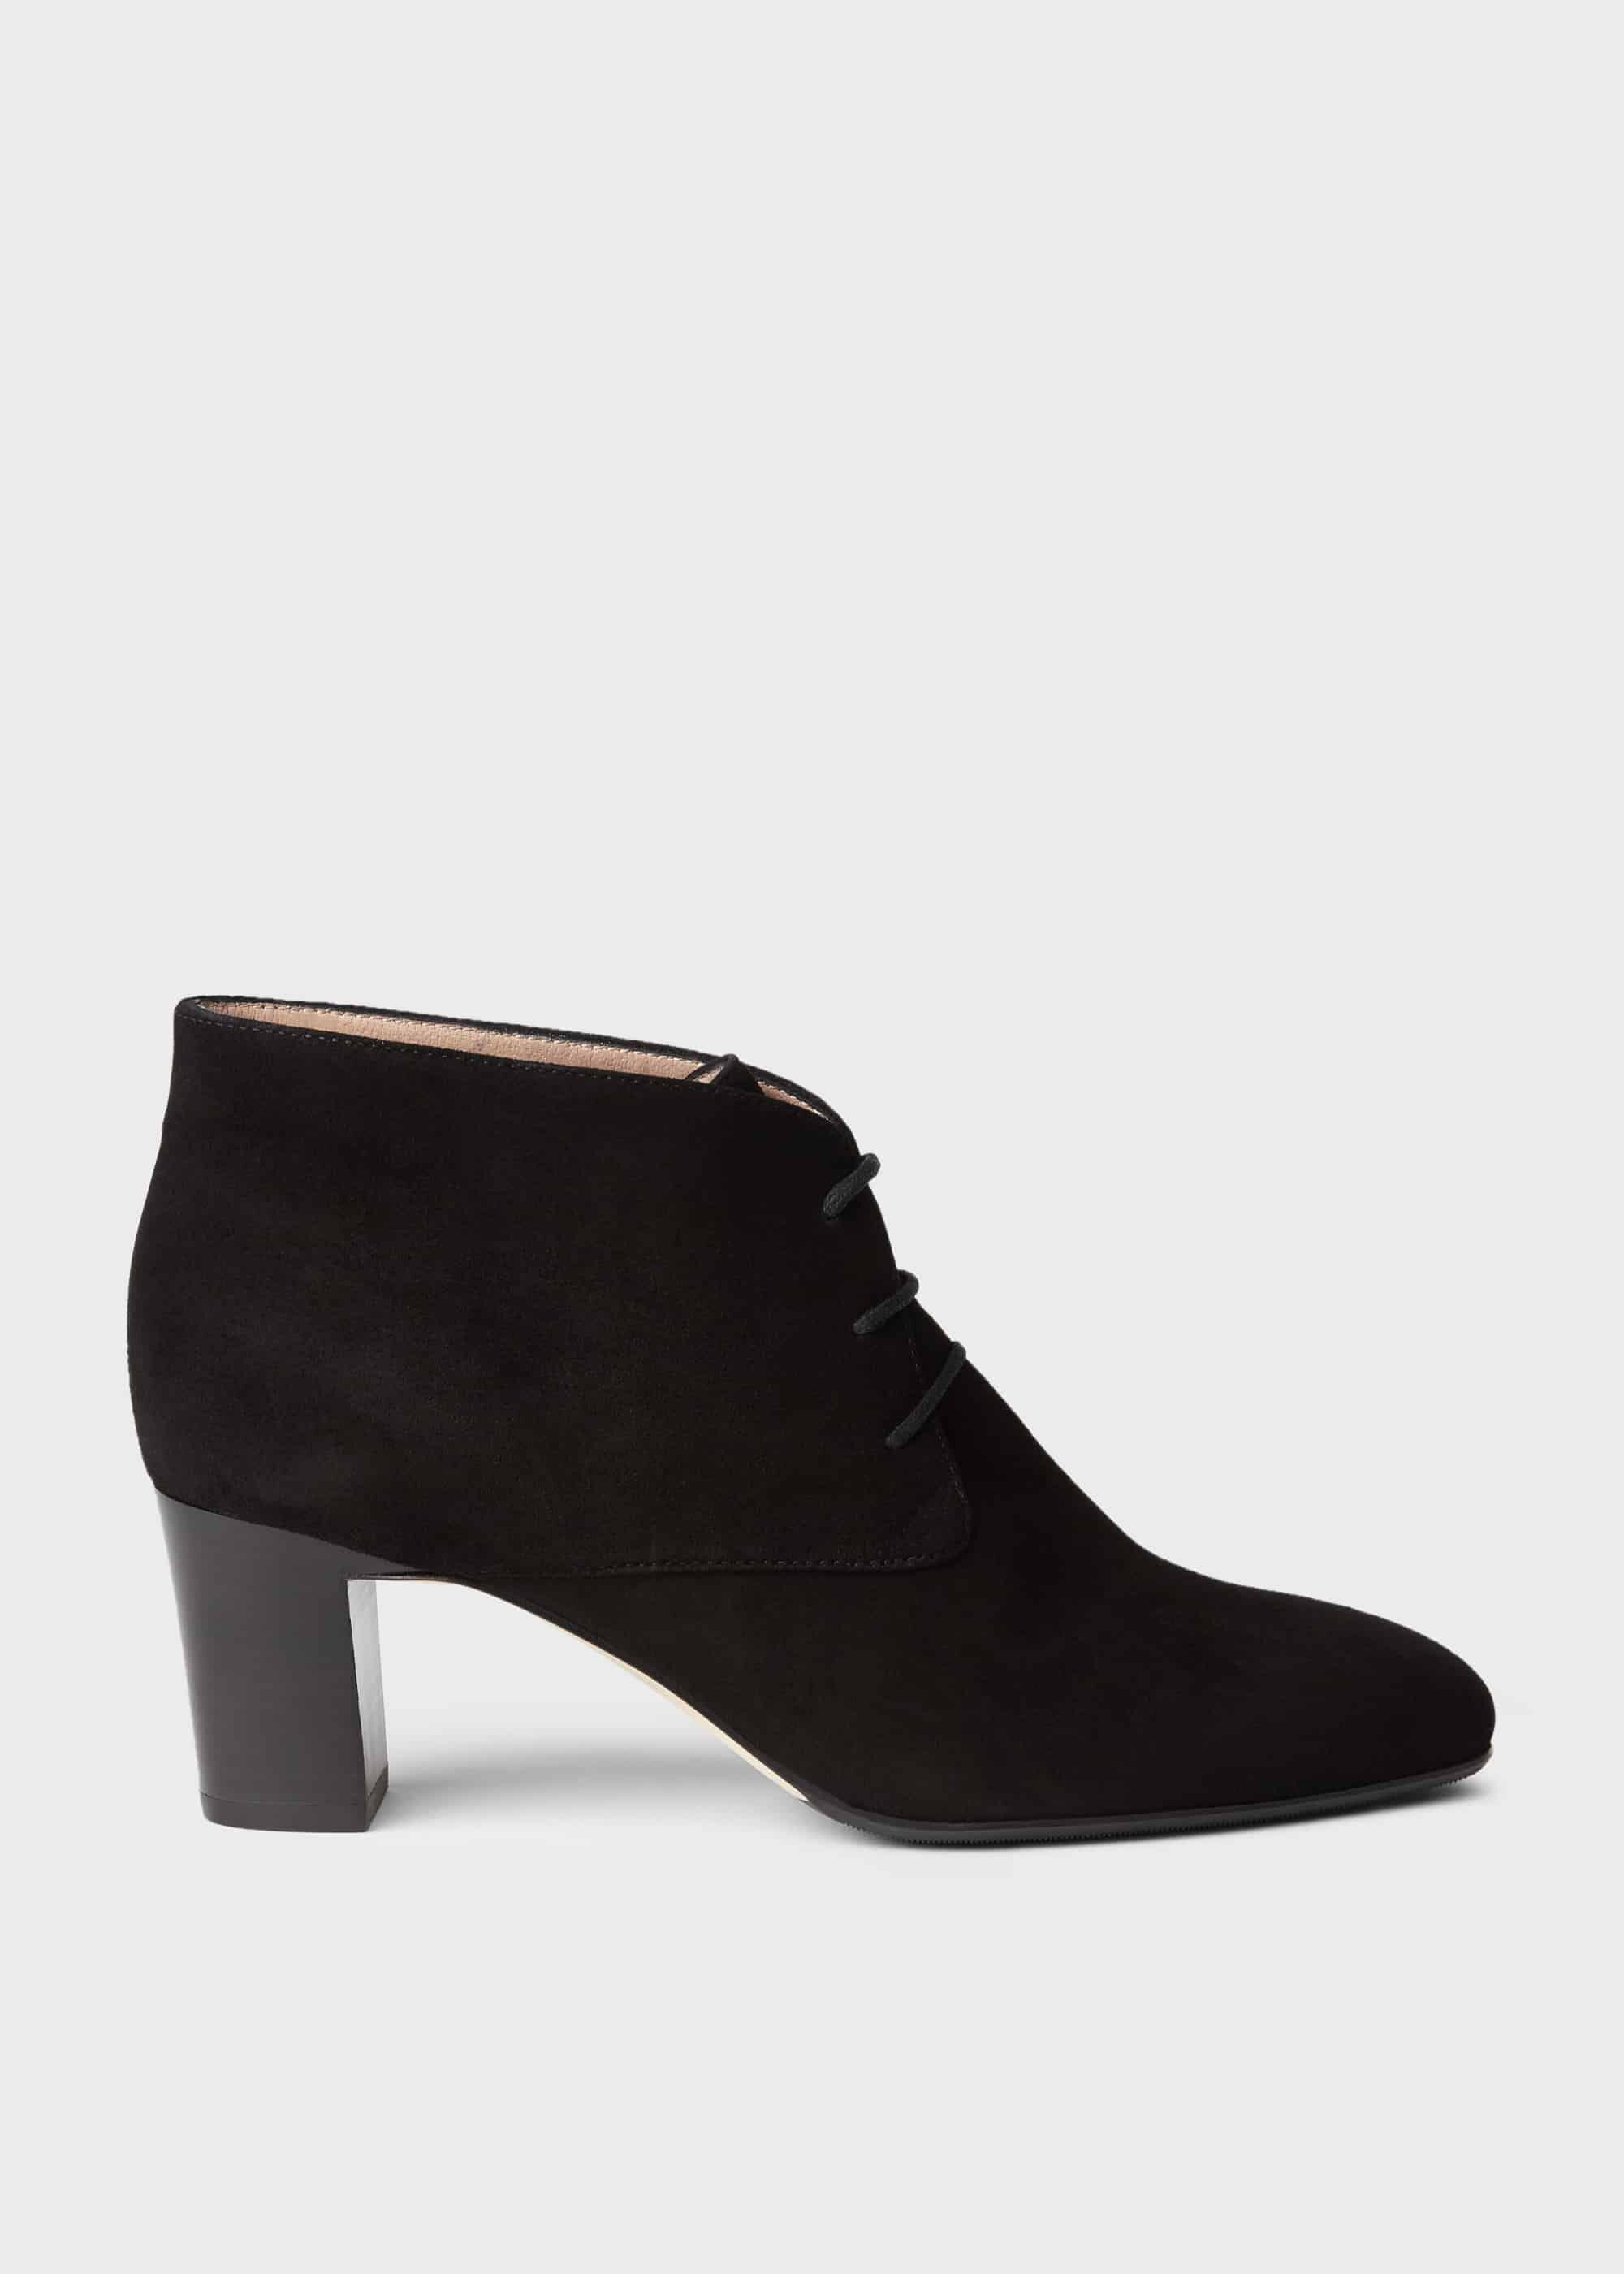 Chelsea \u0026 Knee High Boots